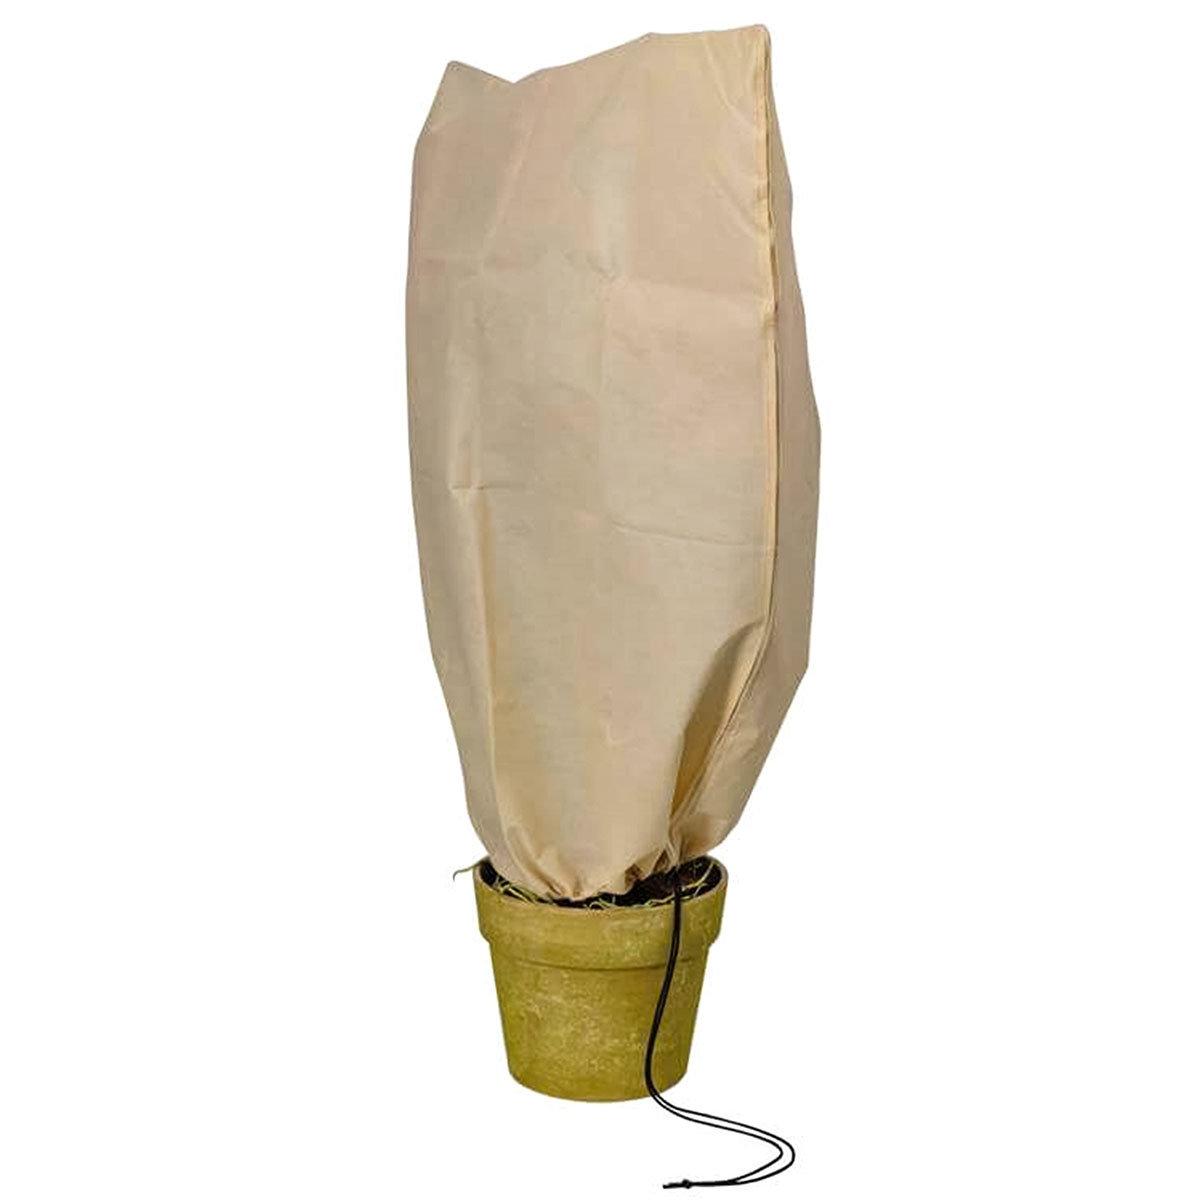 Kübelpflanzen-Sack, 2er-Set, 180x120 cm   #4